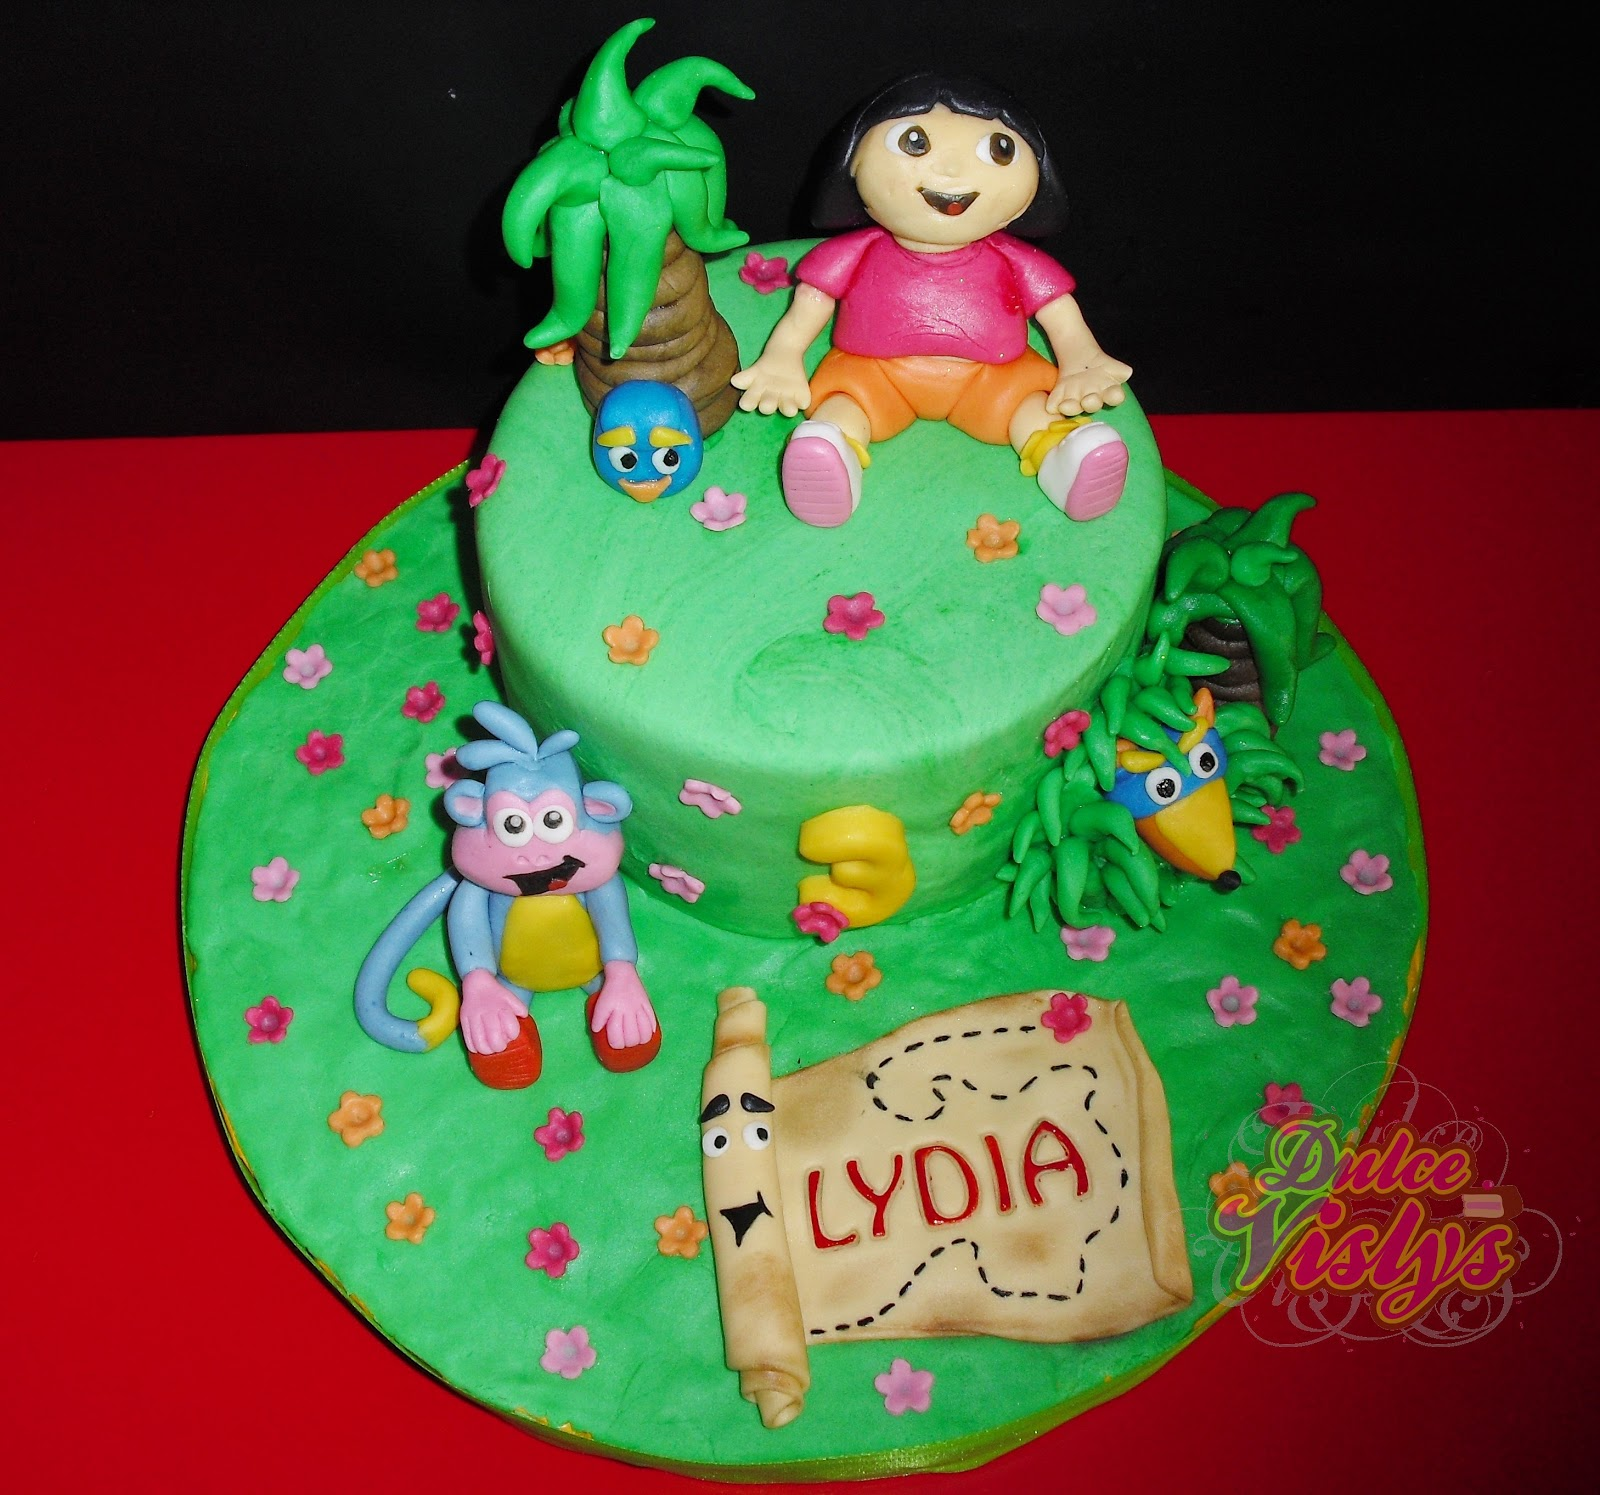 La cocina de vislys tarta dora exploradora - Dora la exploradora cocina ...